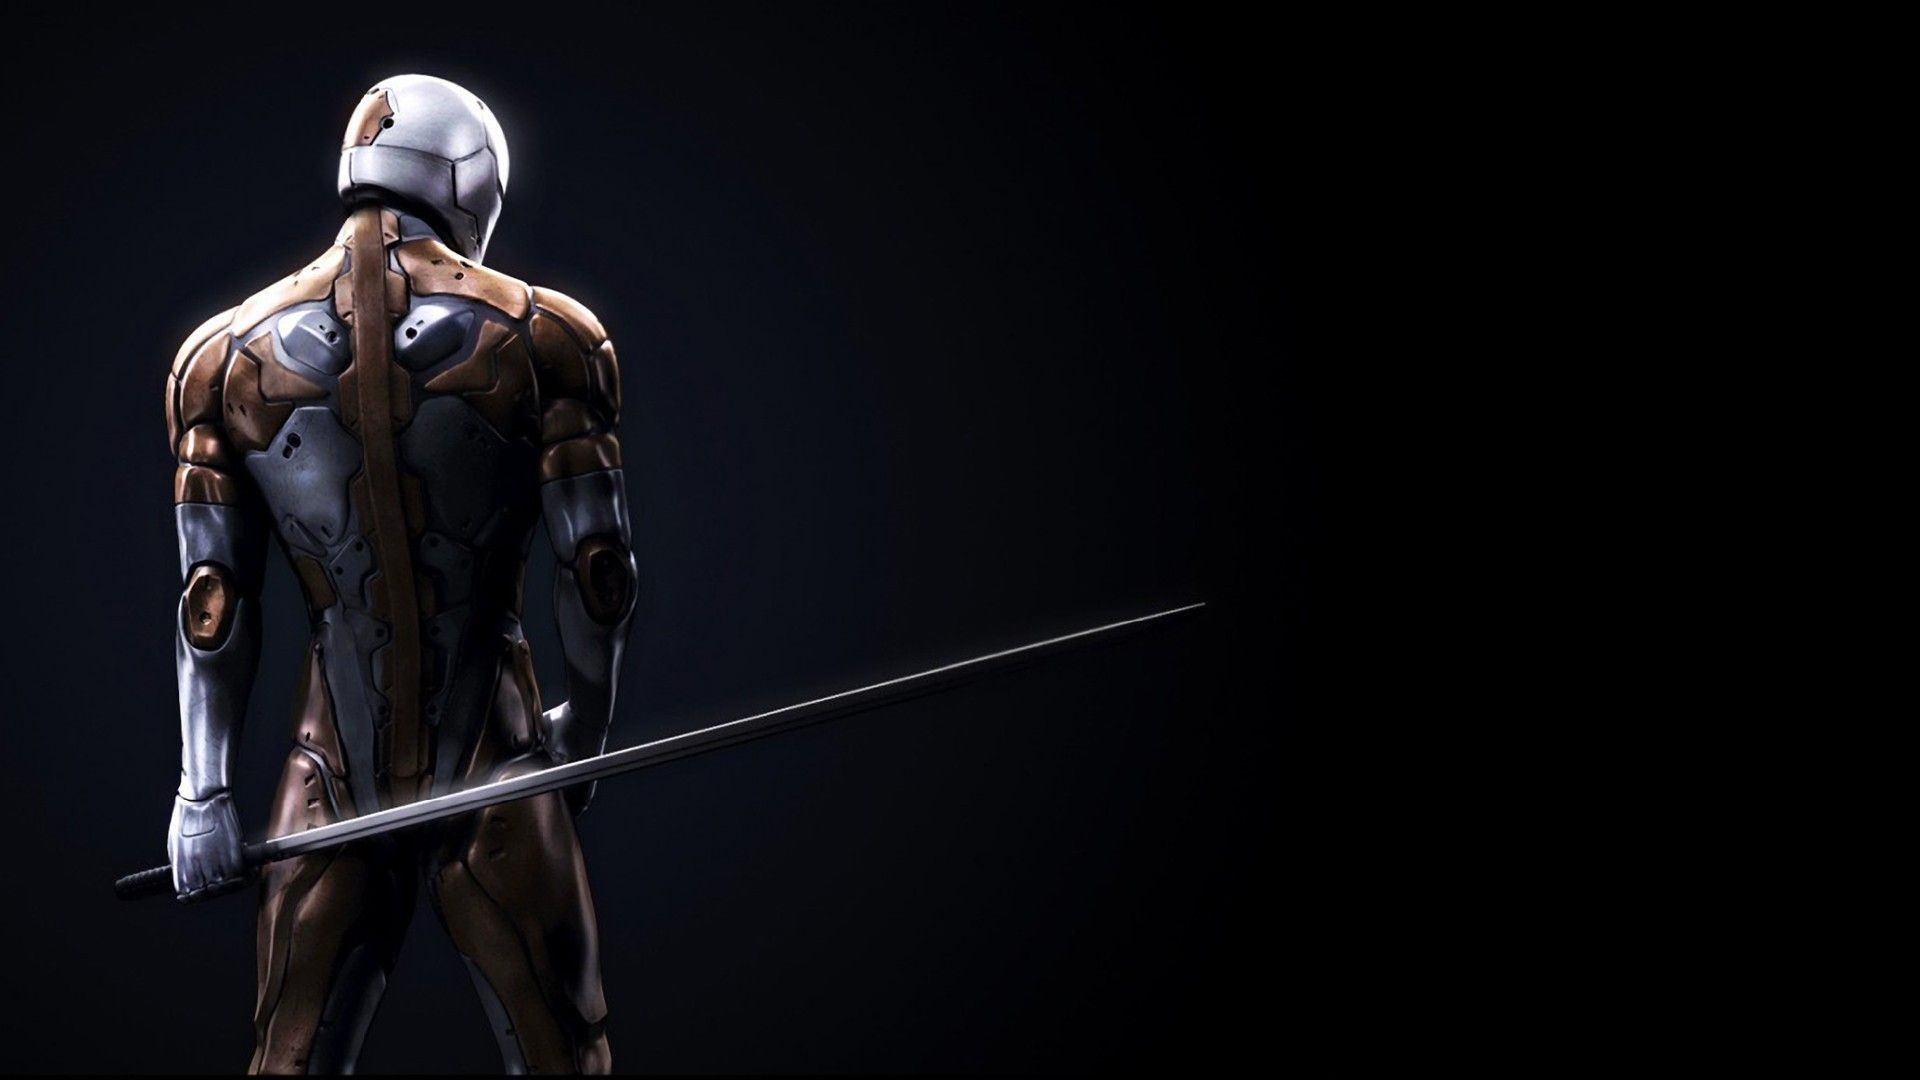 Gray Fox – Metal Gear Solid HD Wallpaper 1920×1080